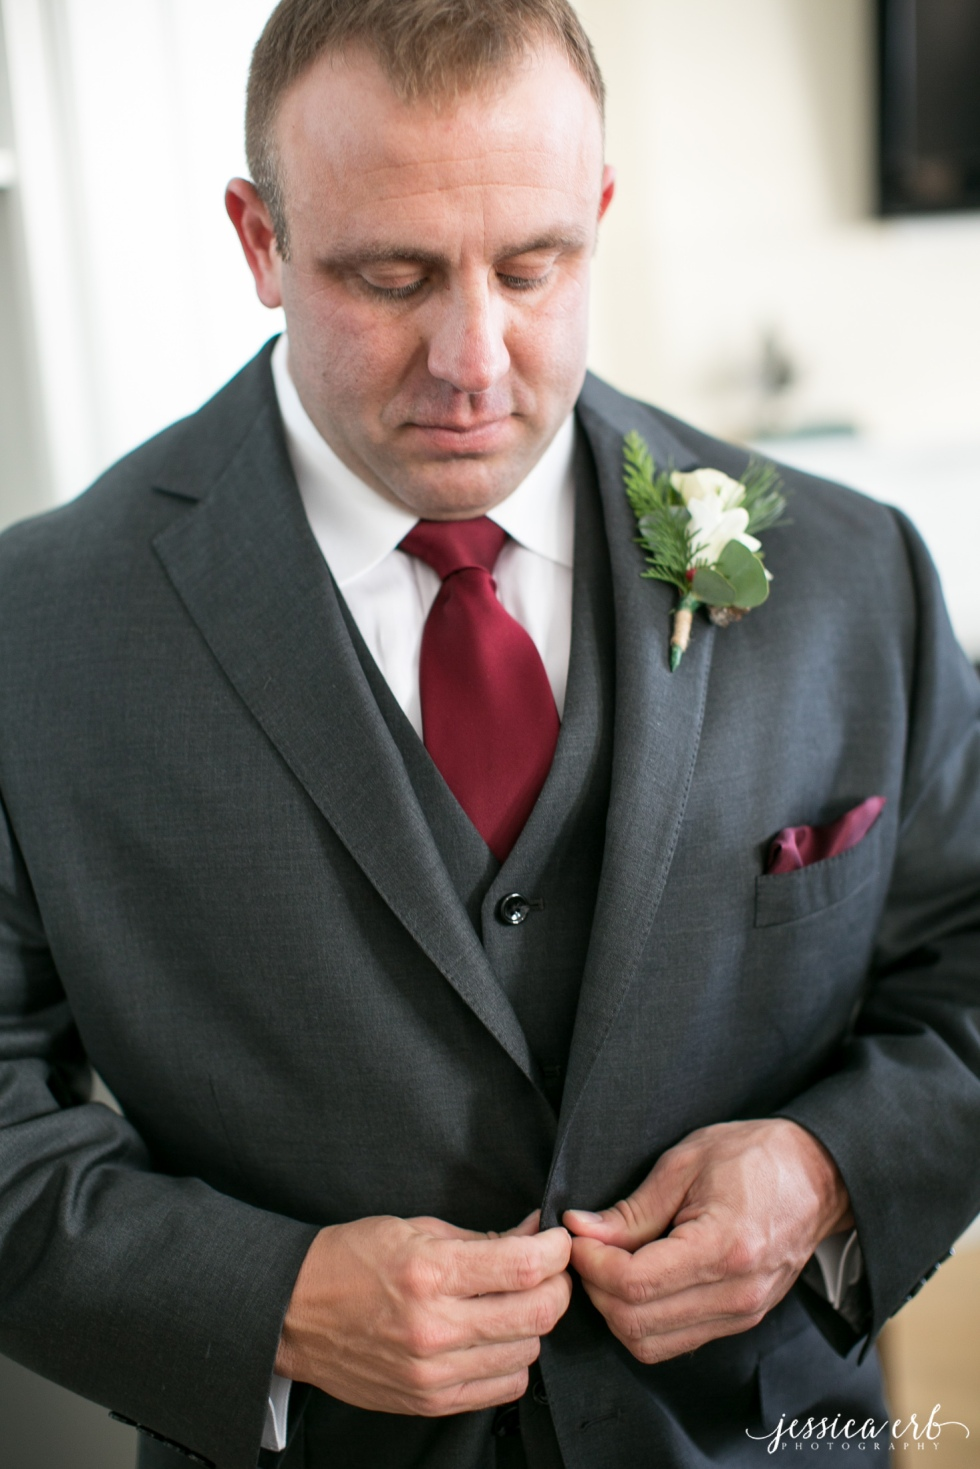 bonnet-island-wedding-planner-11